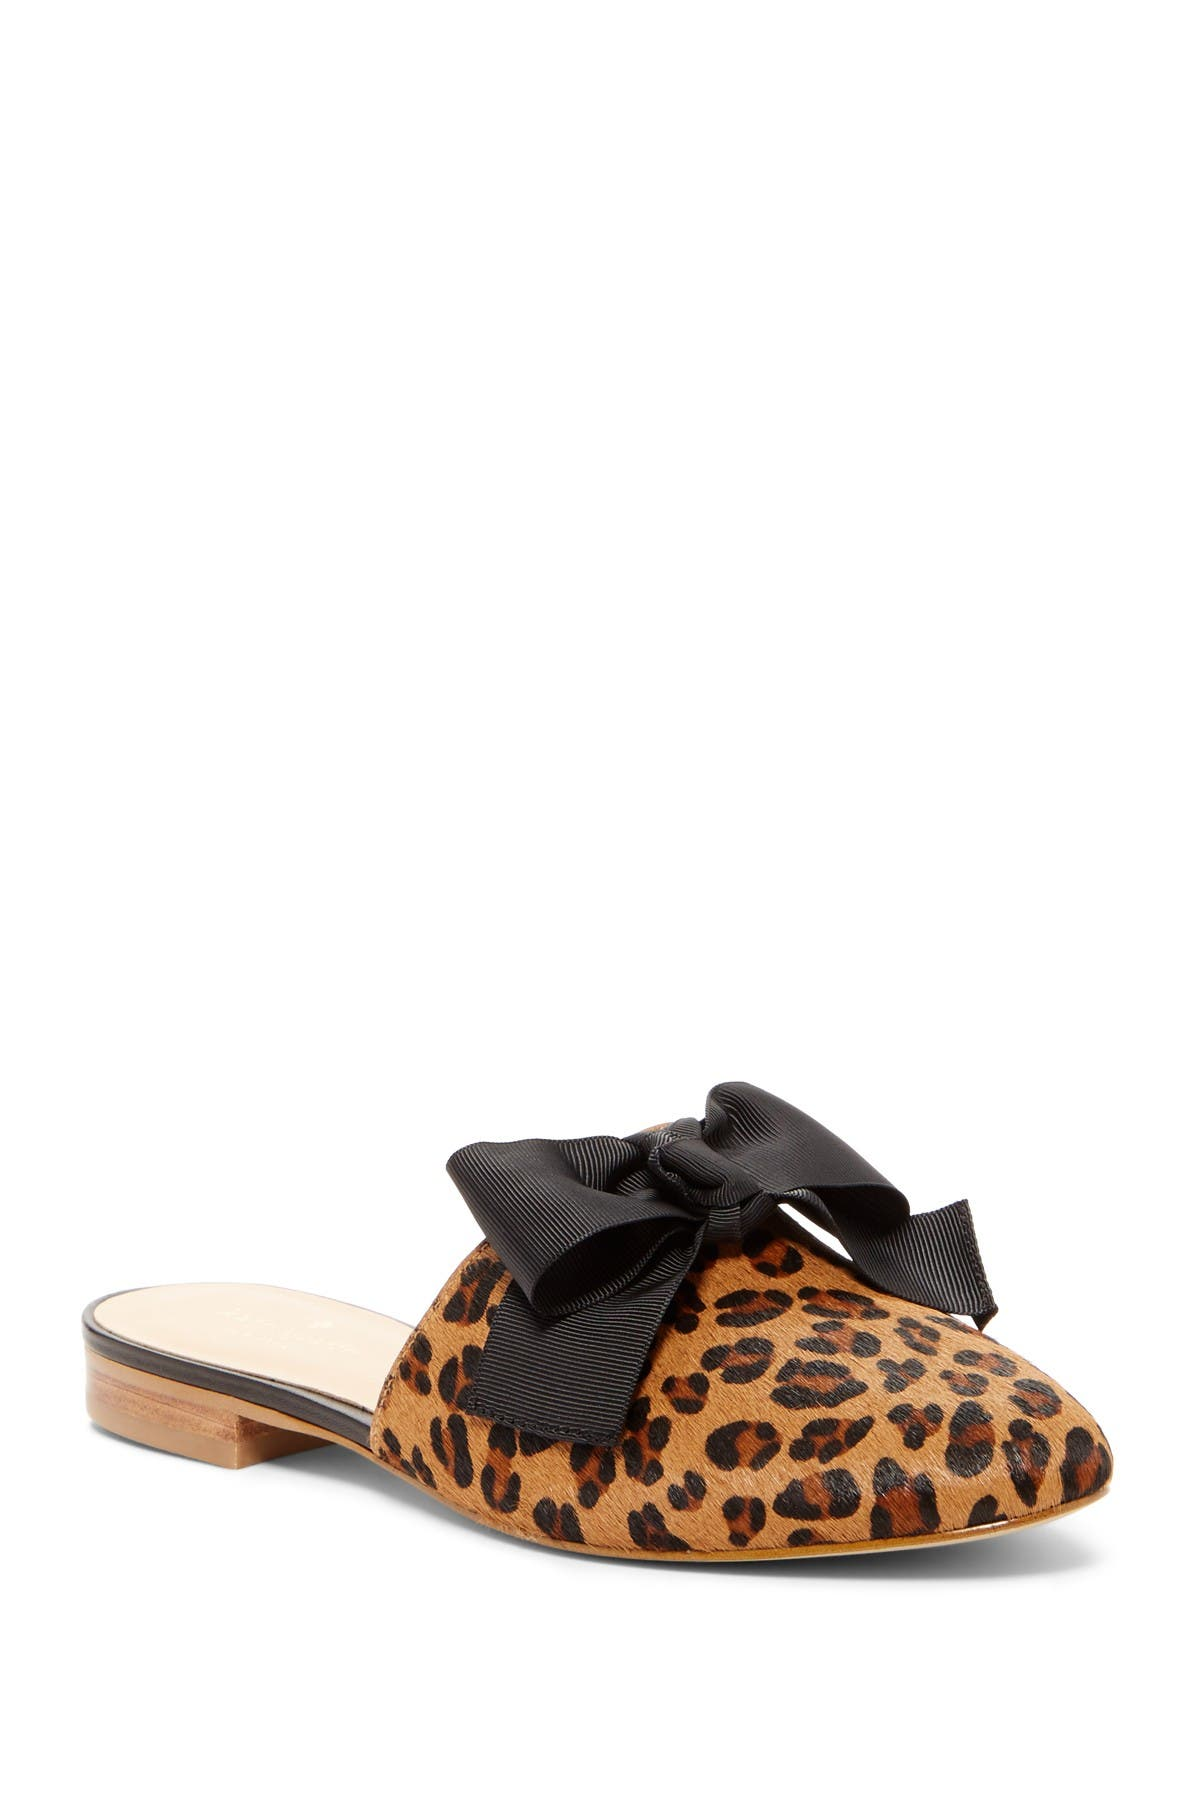 madra leopard print genuine calf hair